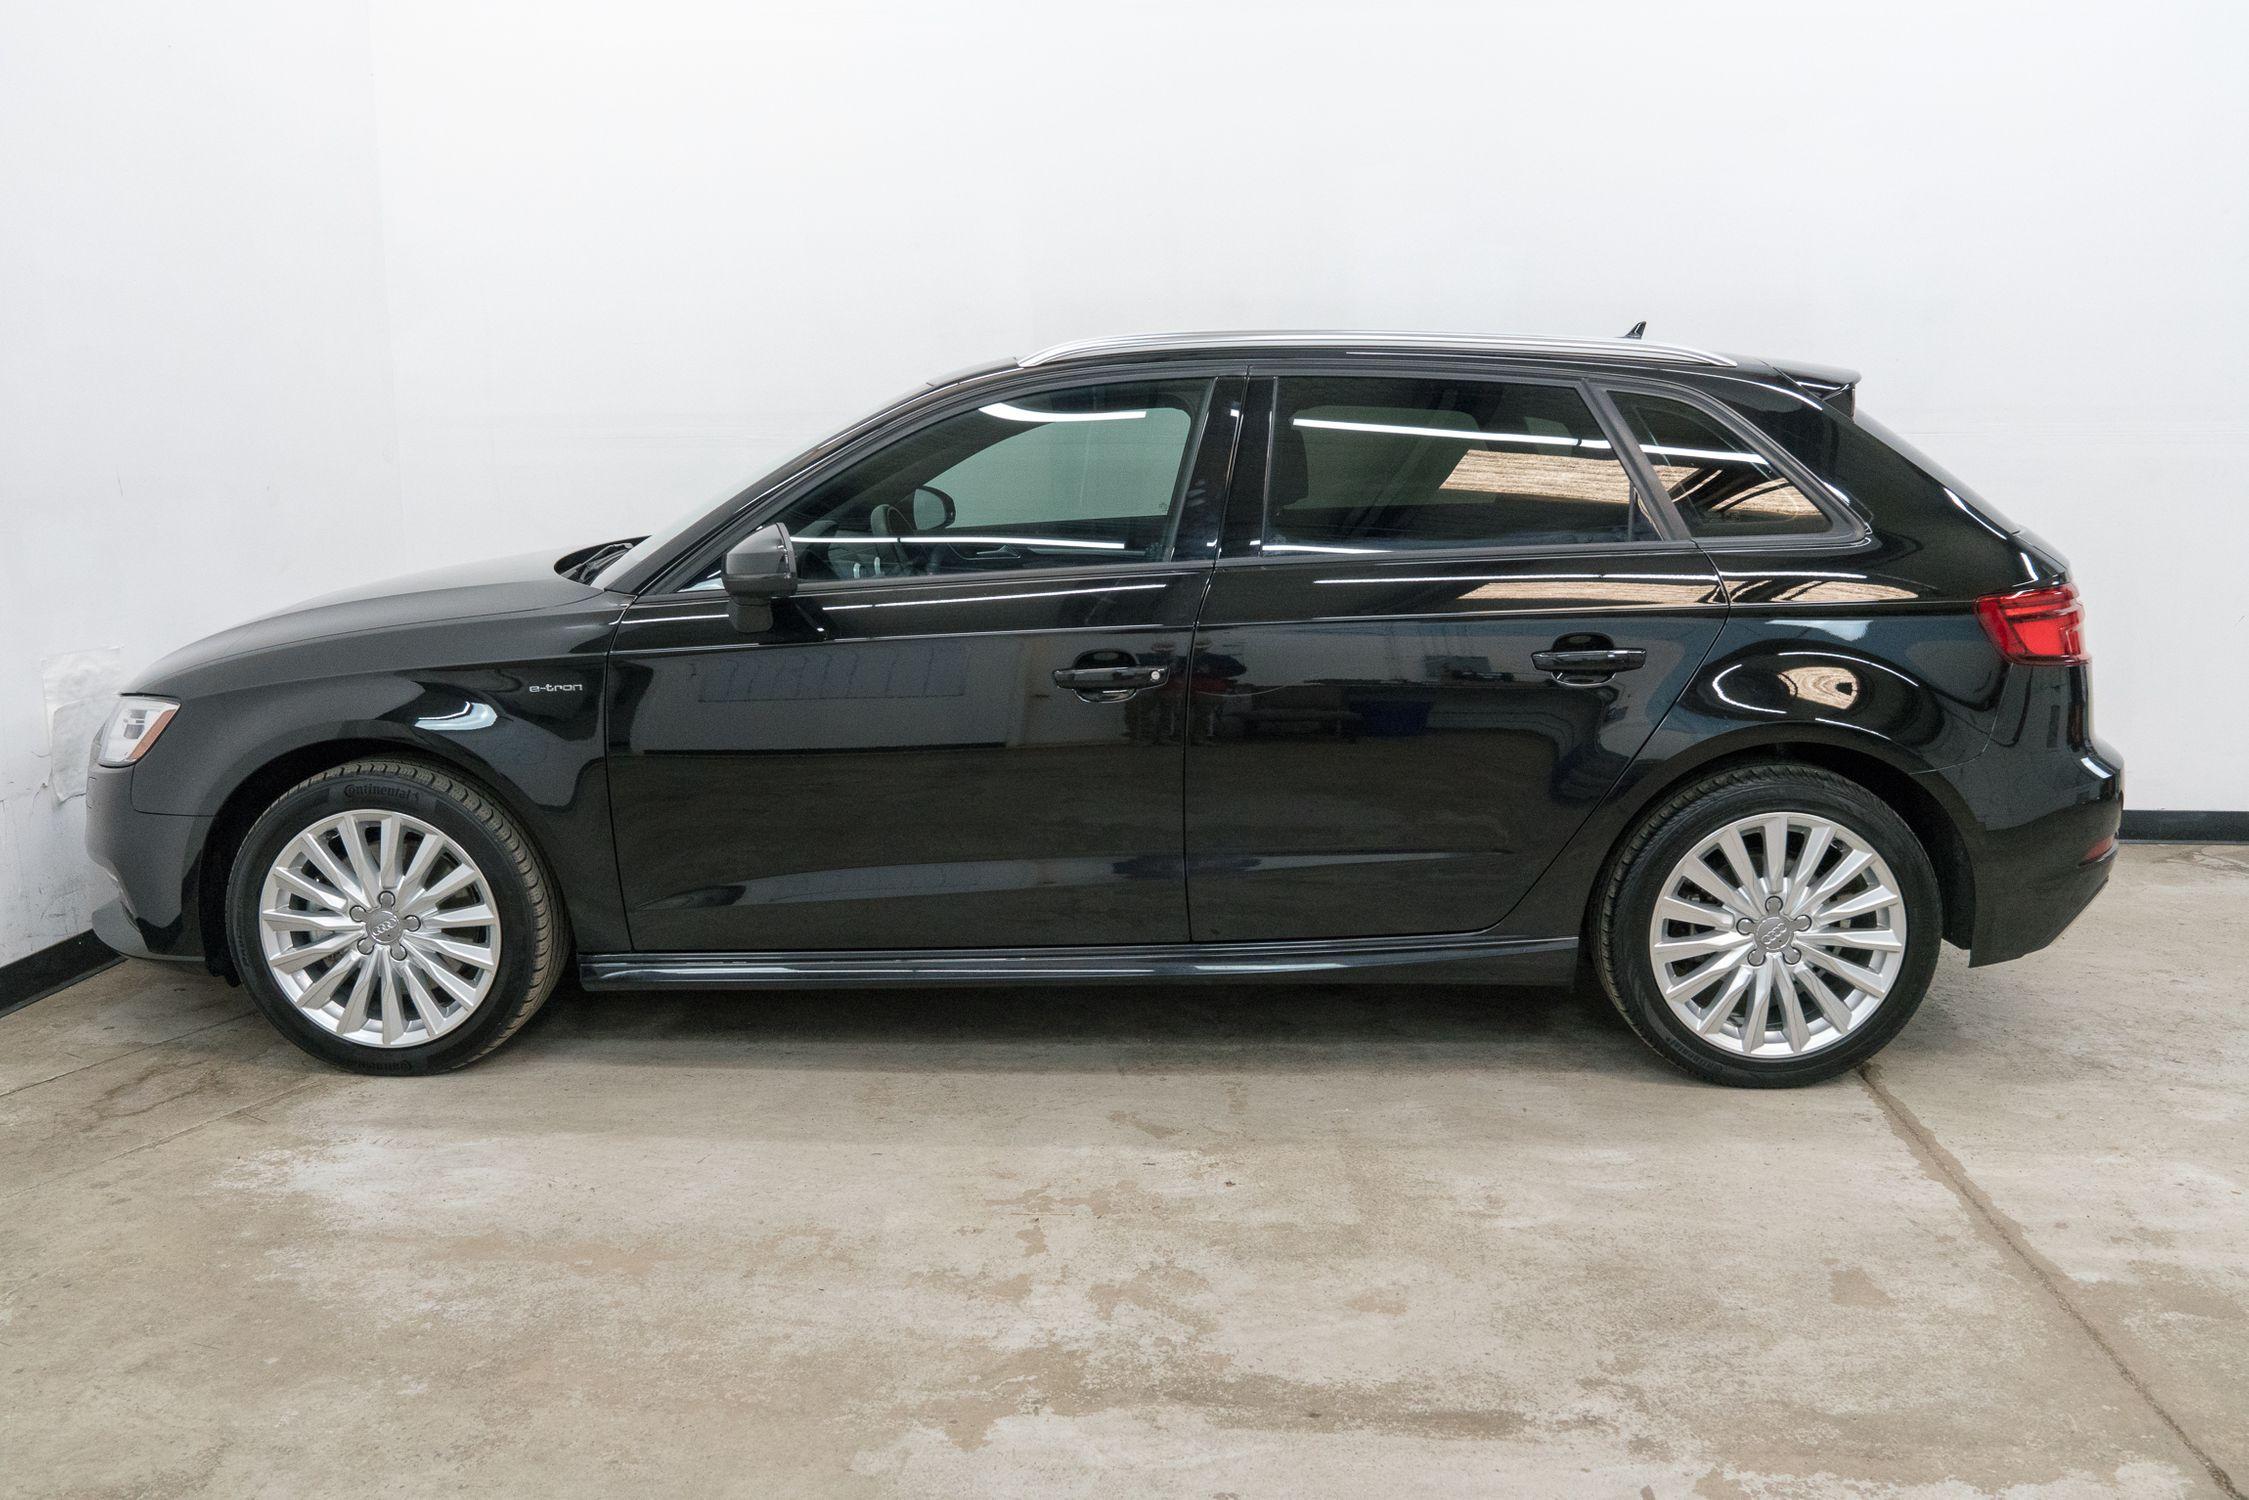 2017 Audi A3 Sportback e tron 1 4T Premium